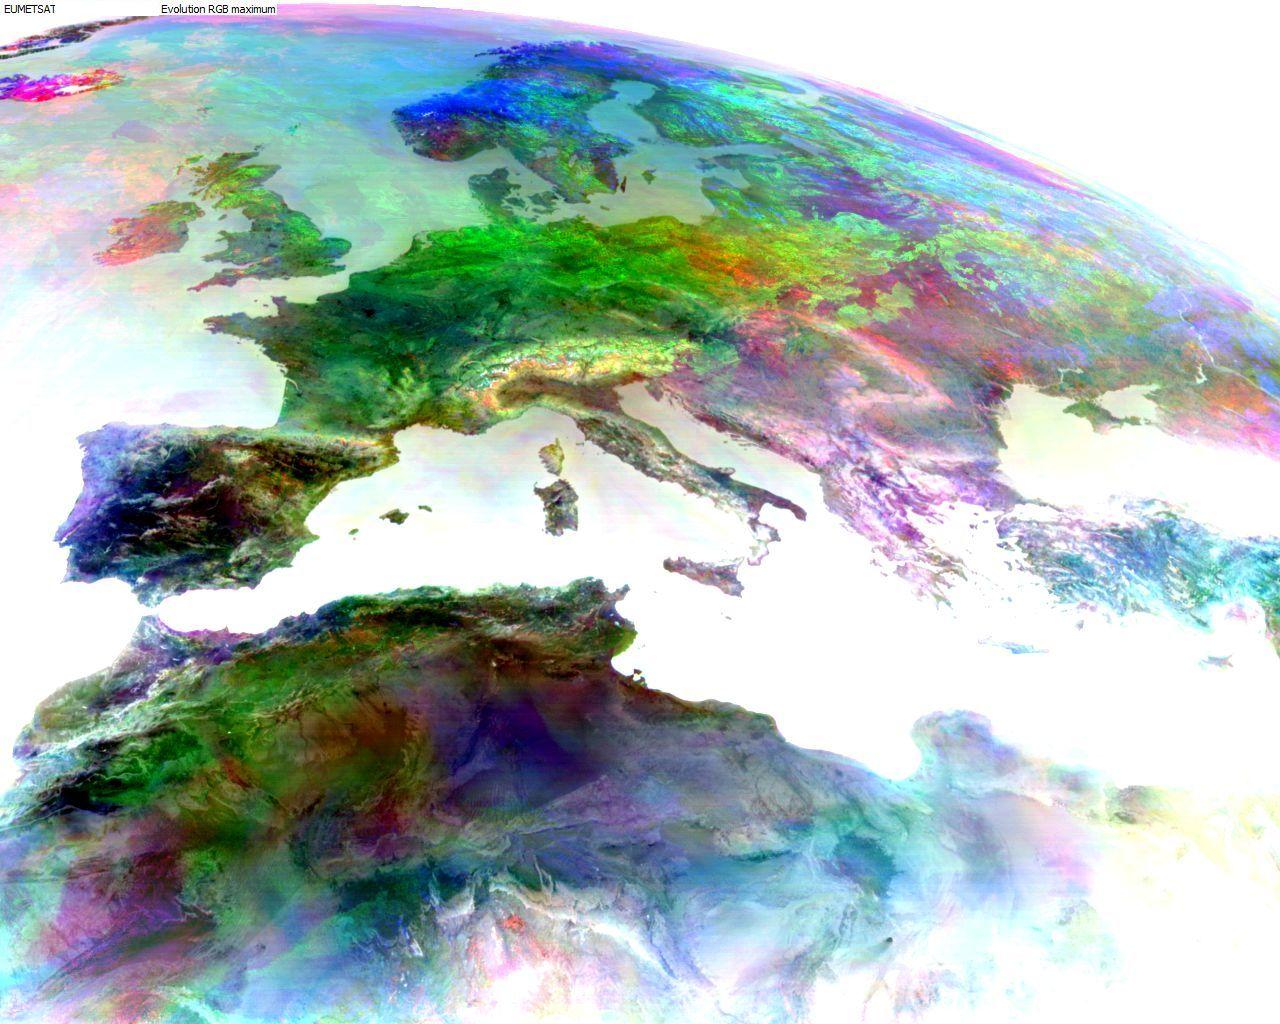 Brightness Temperature Evolution RGB, 24 June-28 July, daily at 13:45 UTC